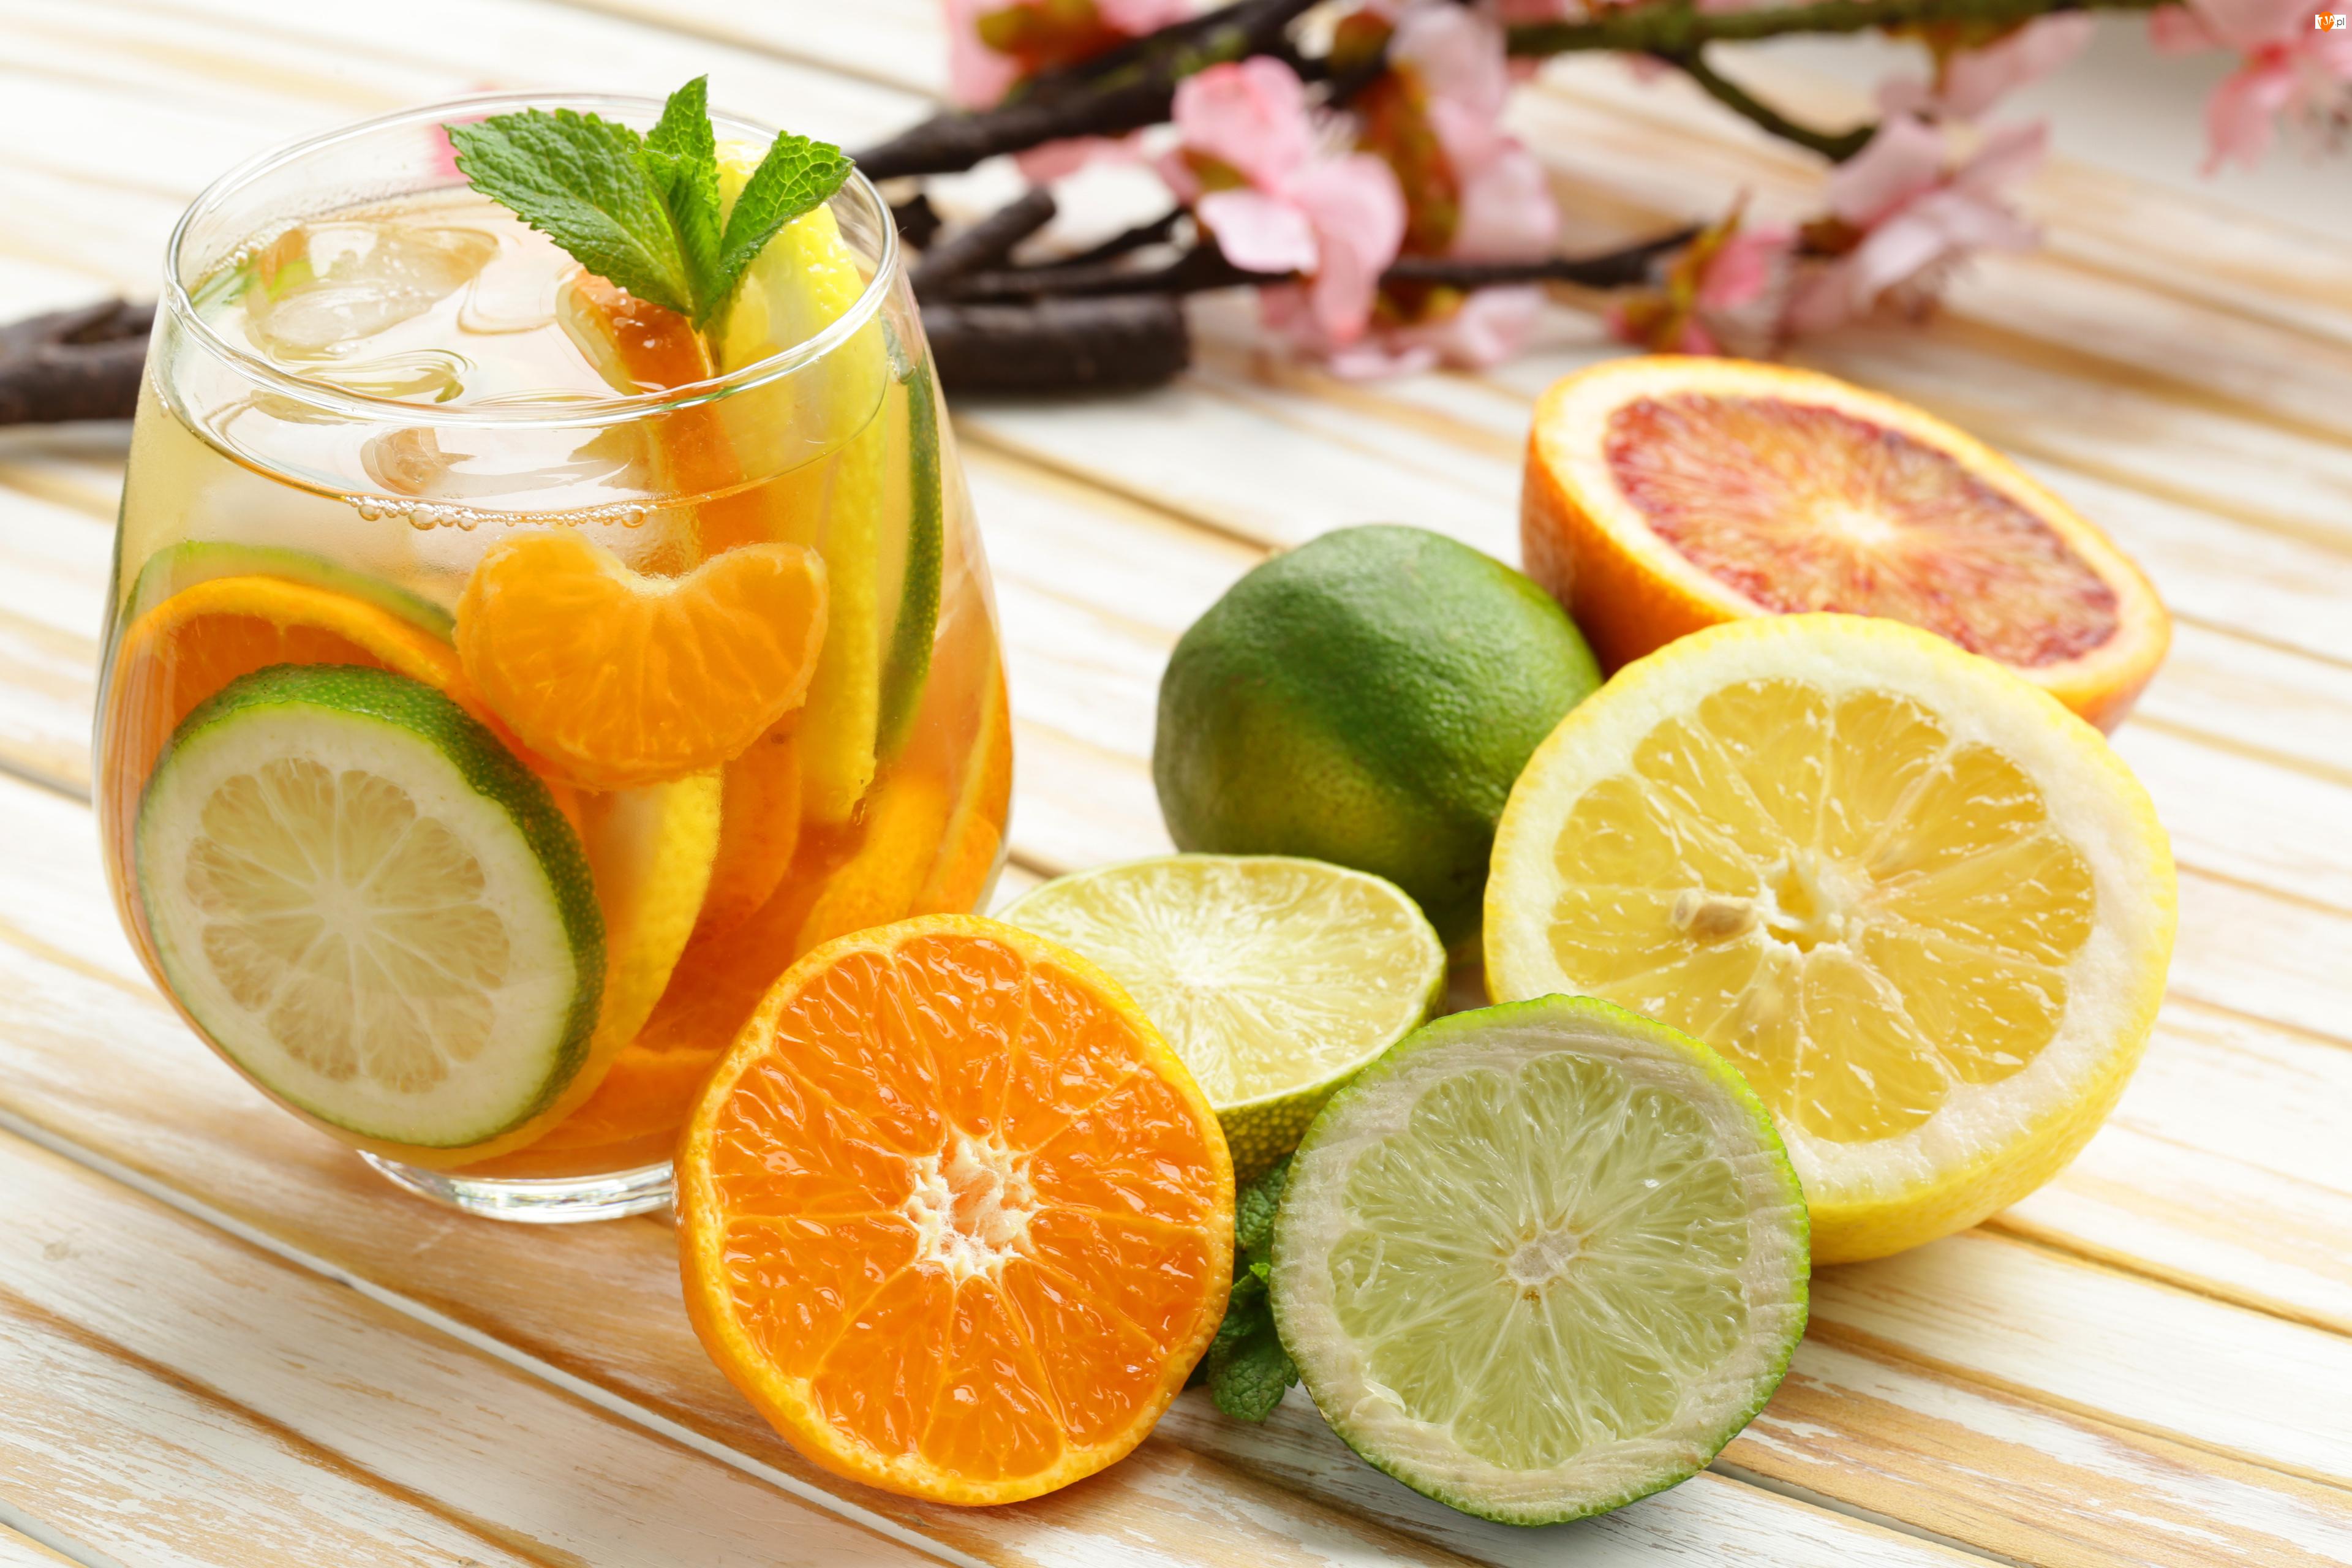 Vitaminecmatinale